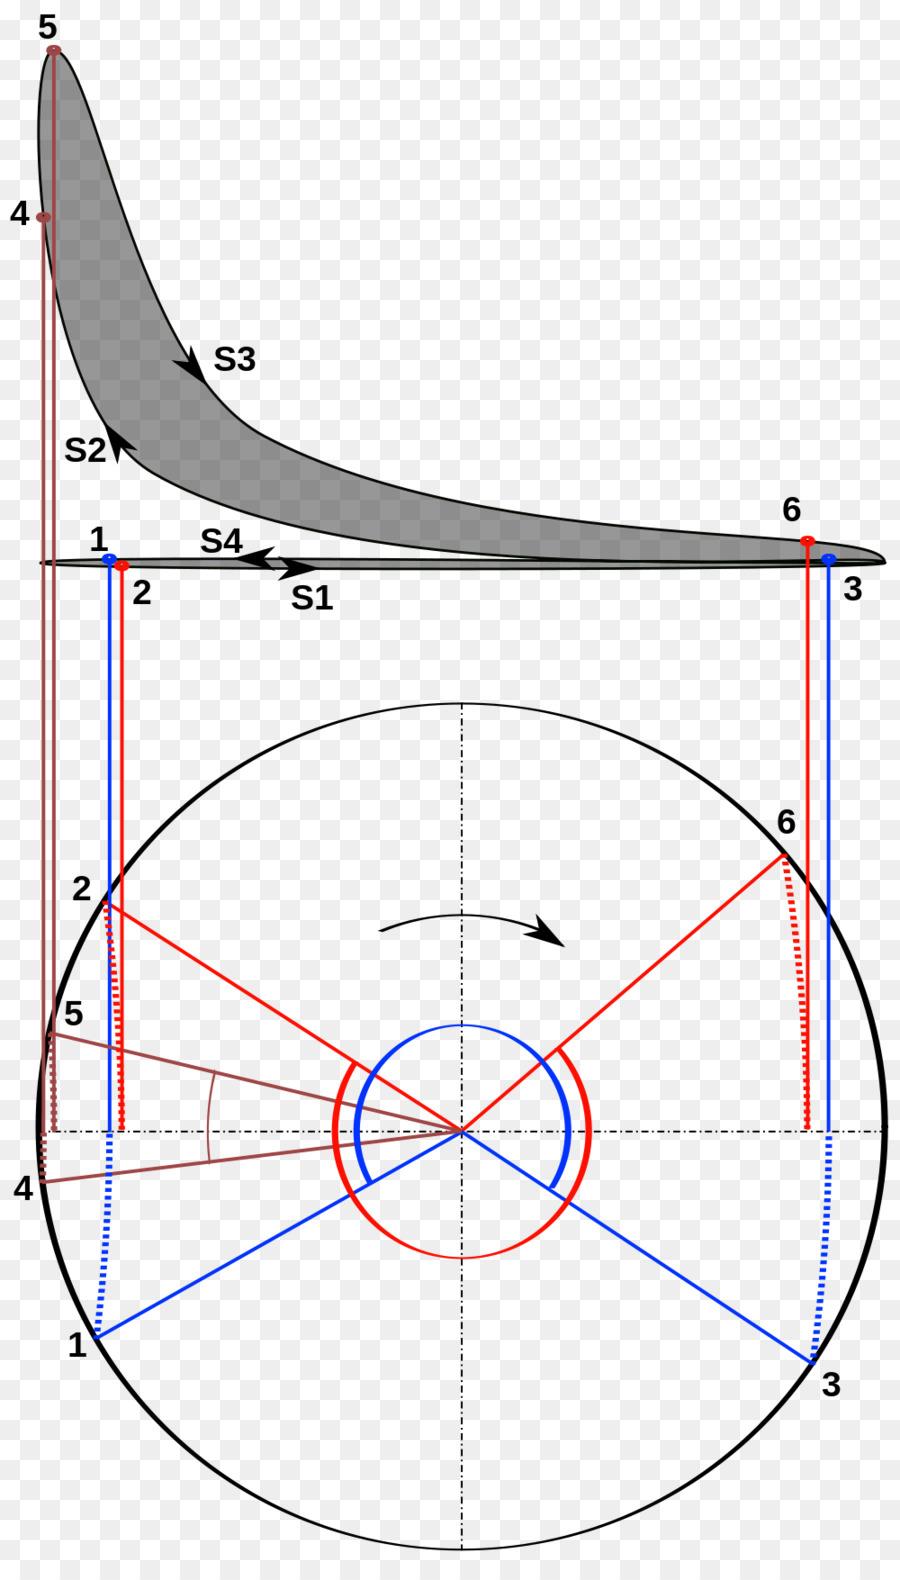 medium resolution of fourstroke engine pressure volume diagram diesel engine line area png